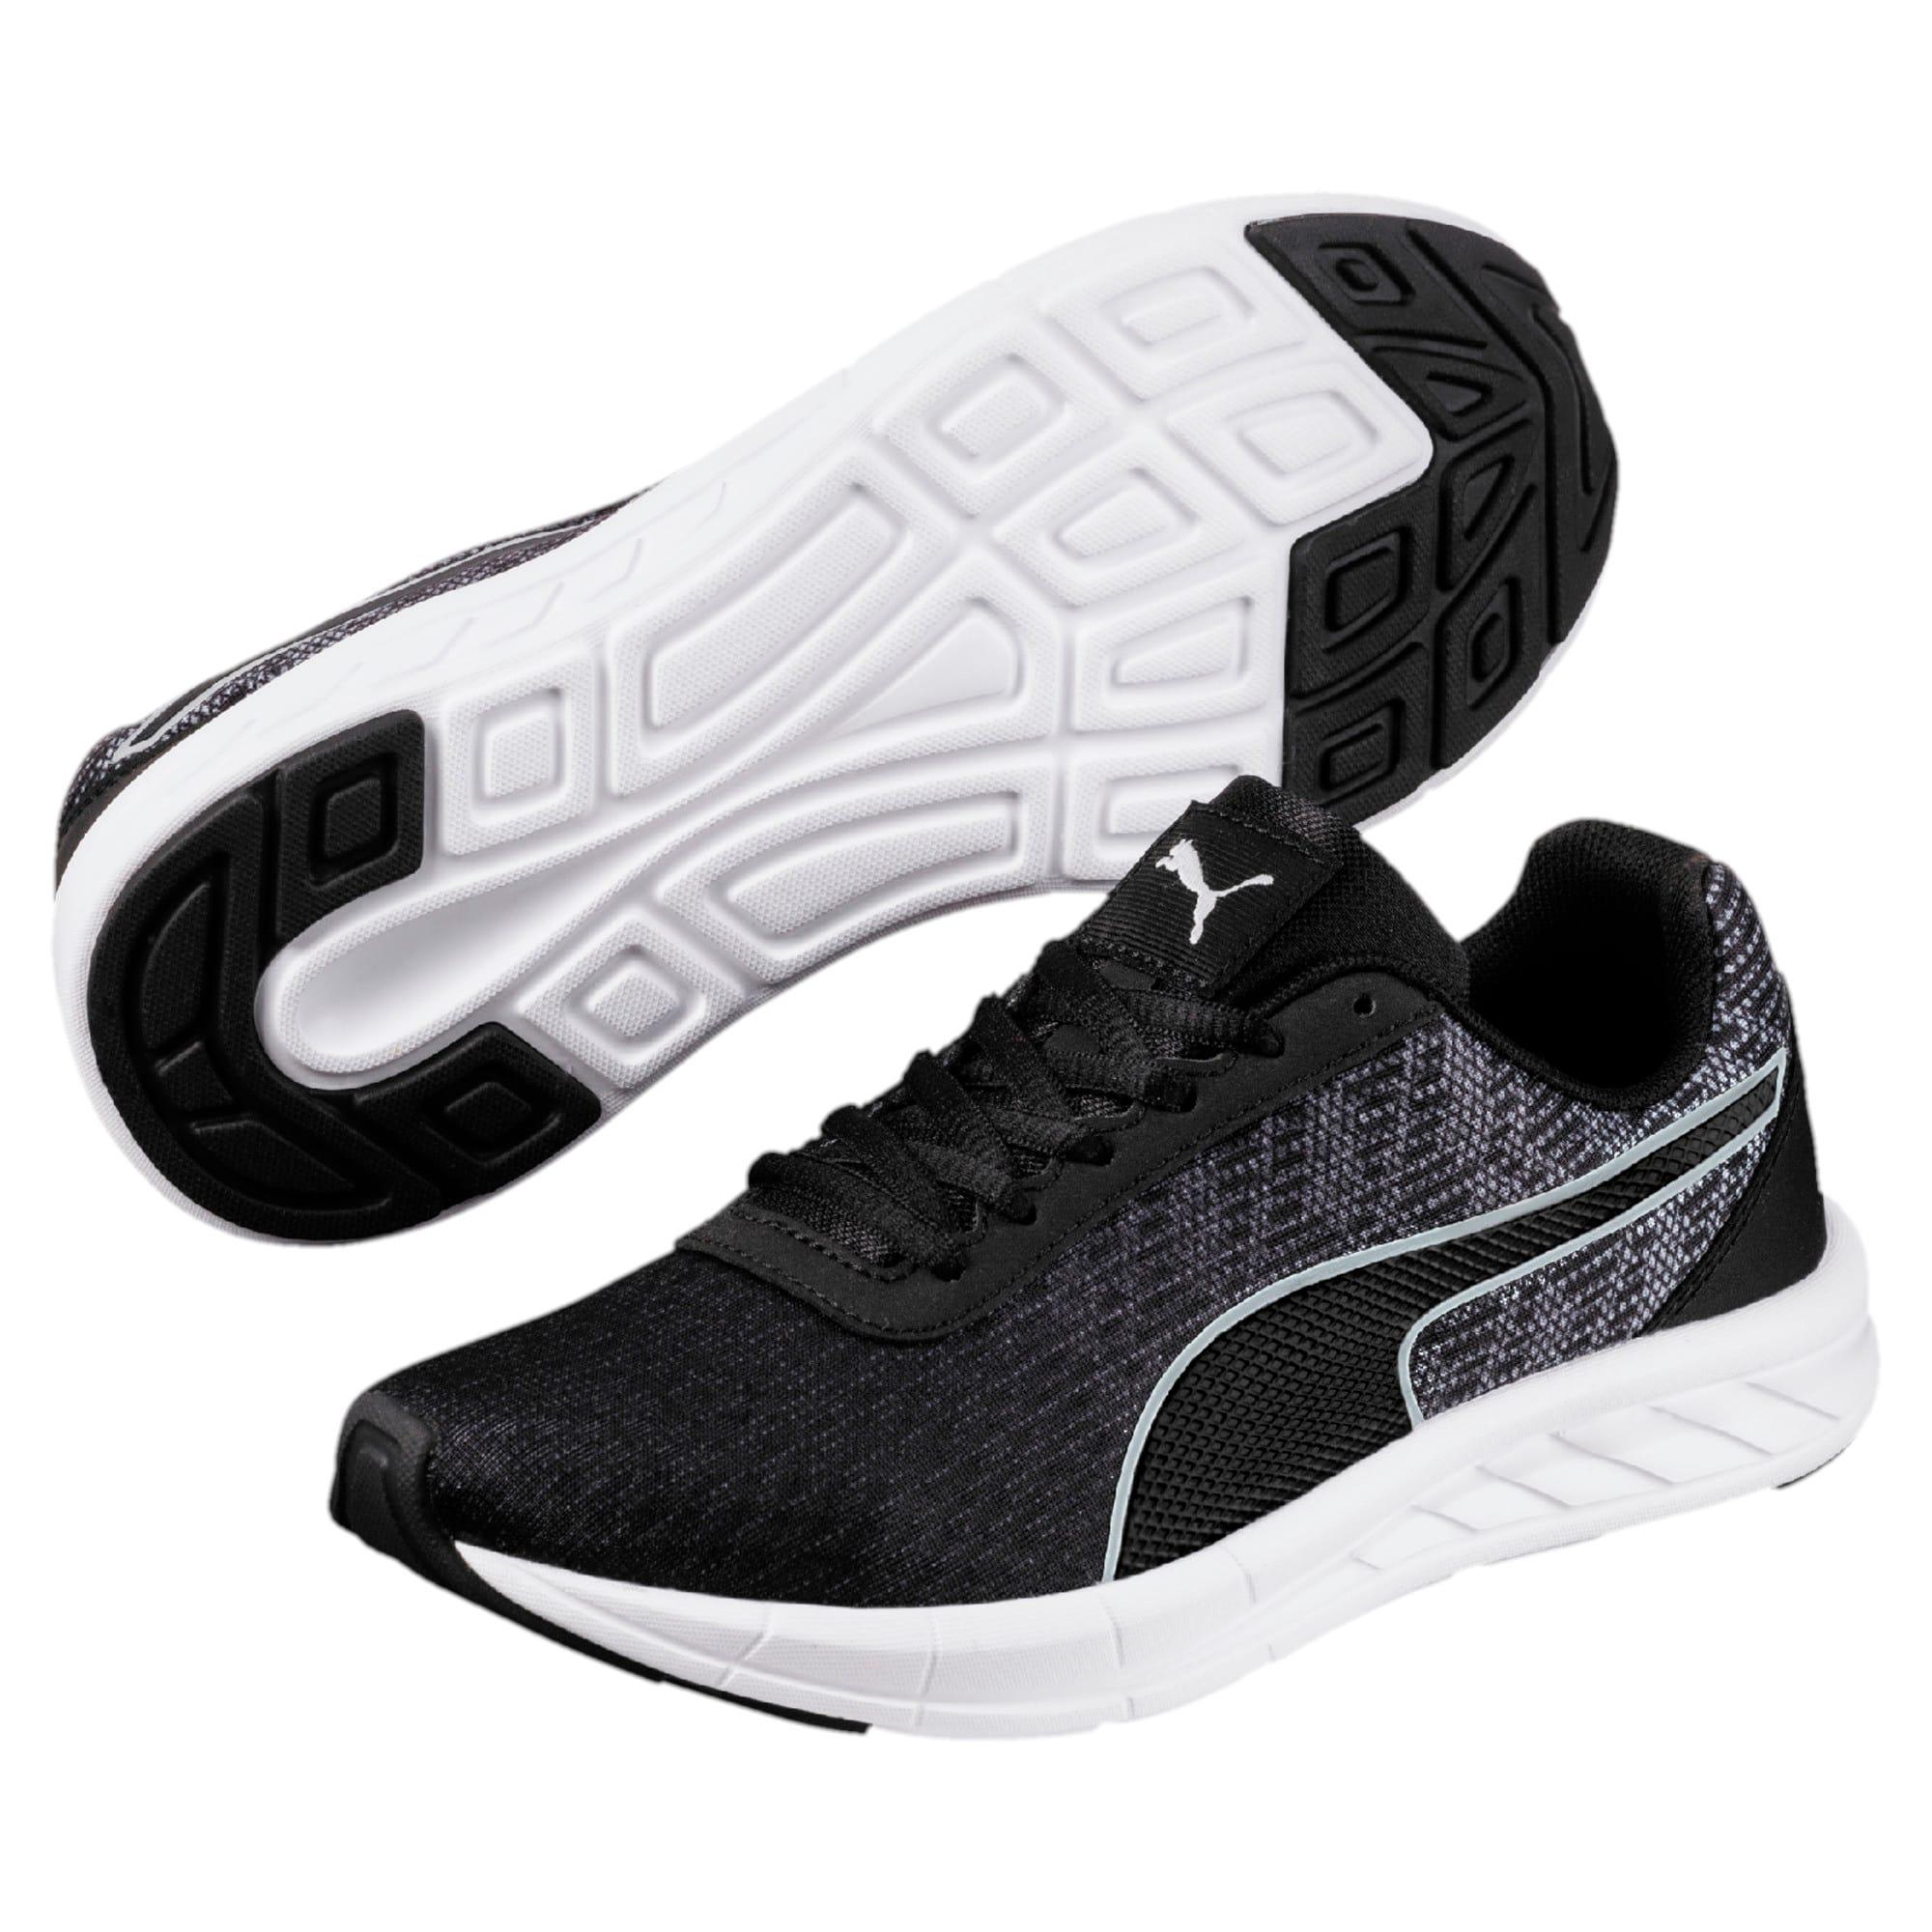 Thumbnail 6 of Comet Kids' Running Shoes, Quarry-Puma Black, medium-IND